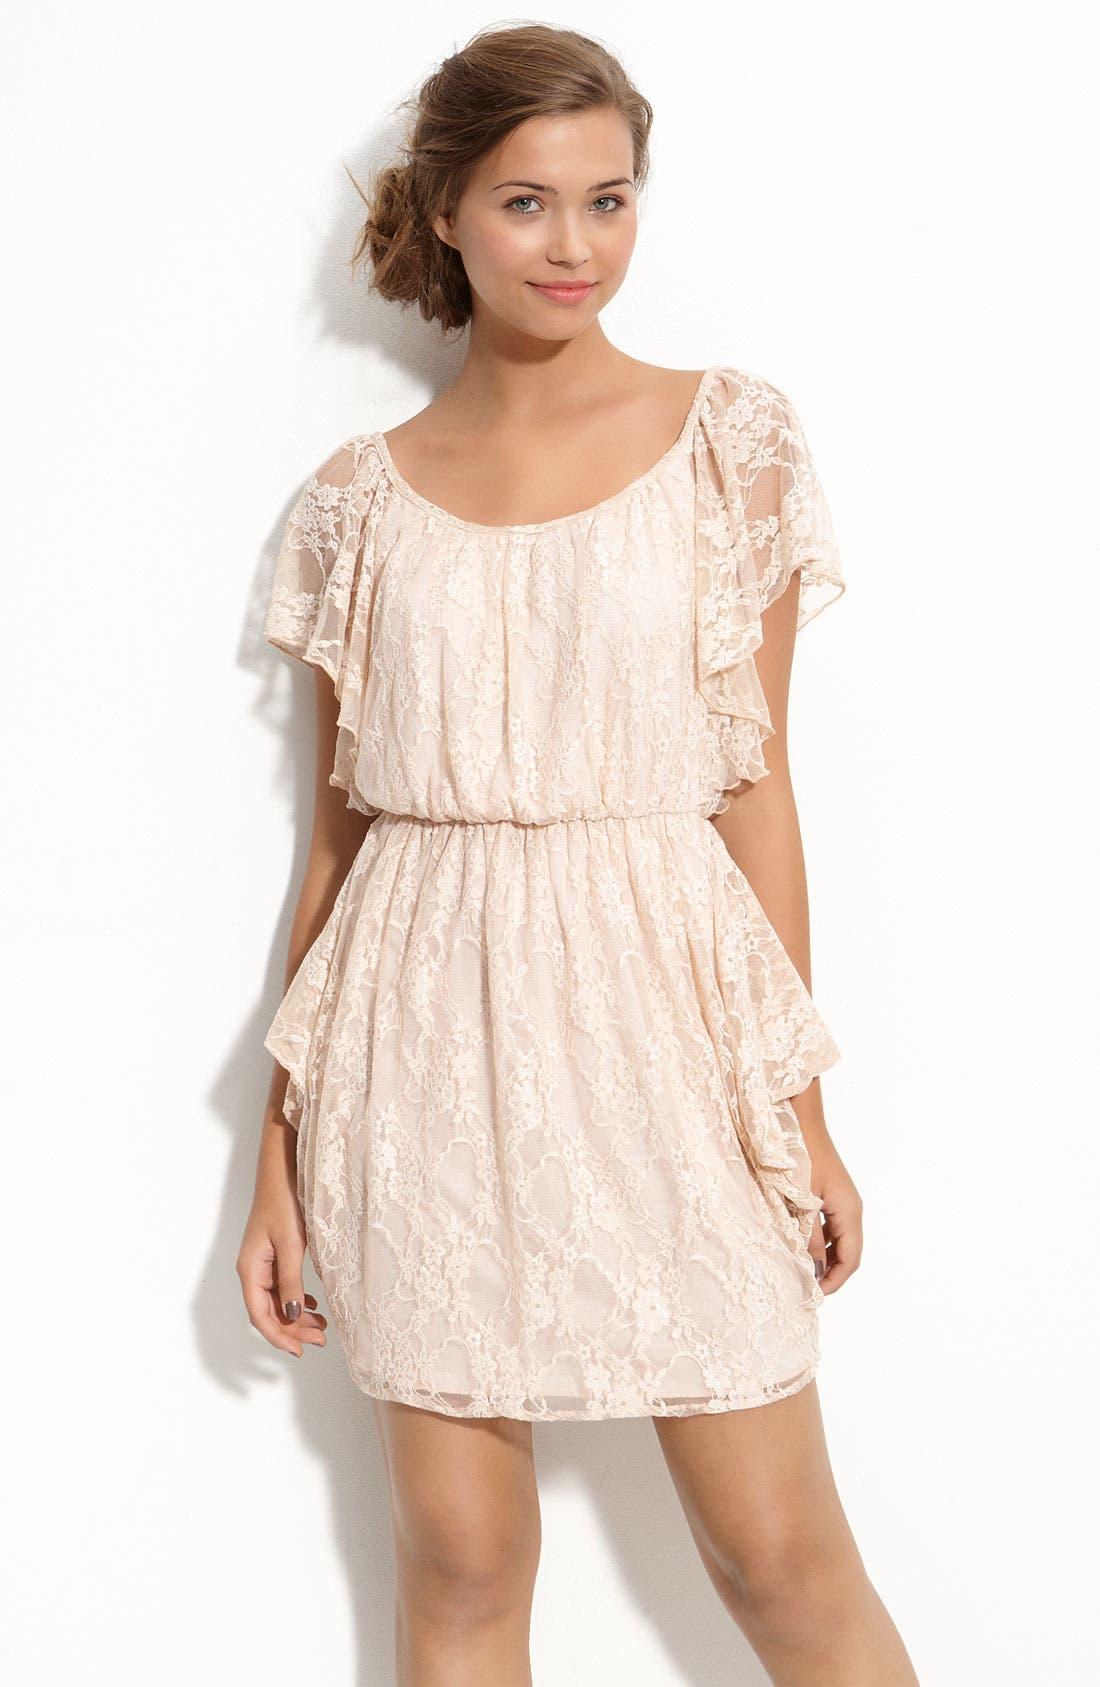 Alternate Image 1 Selected - Velvet Torch Draped Lace Dress (Juniors)